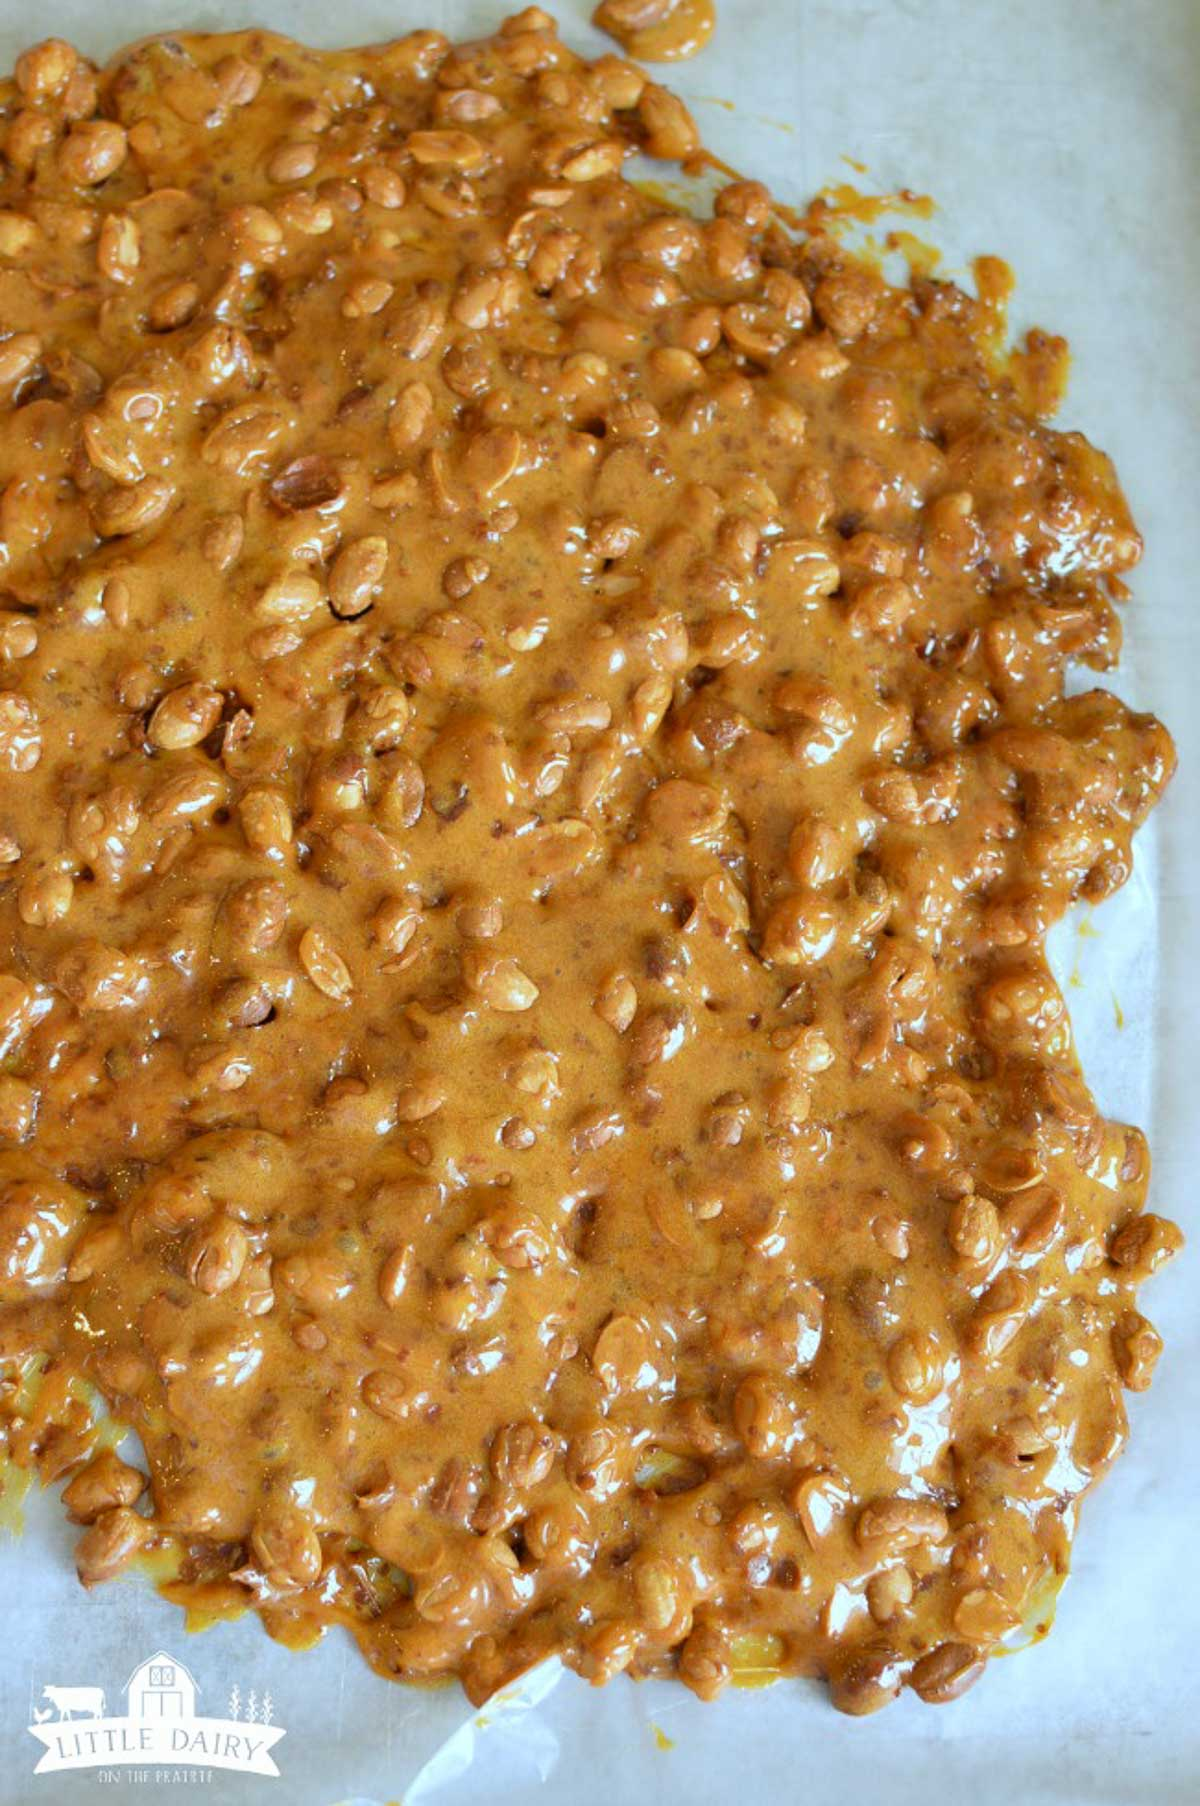 Peanut Brittle on a baking sheet.